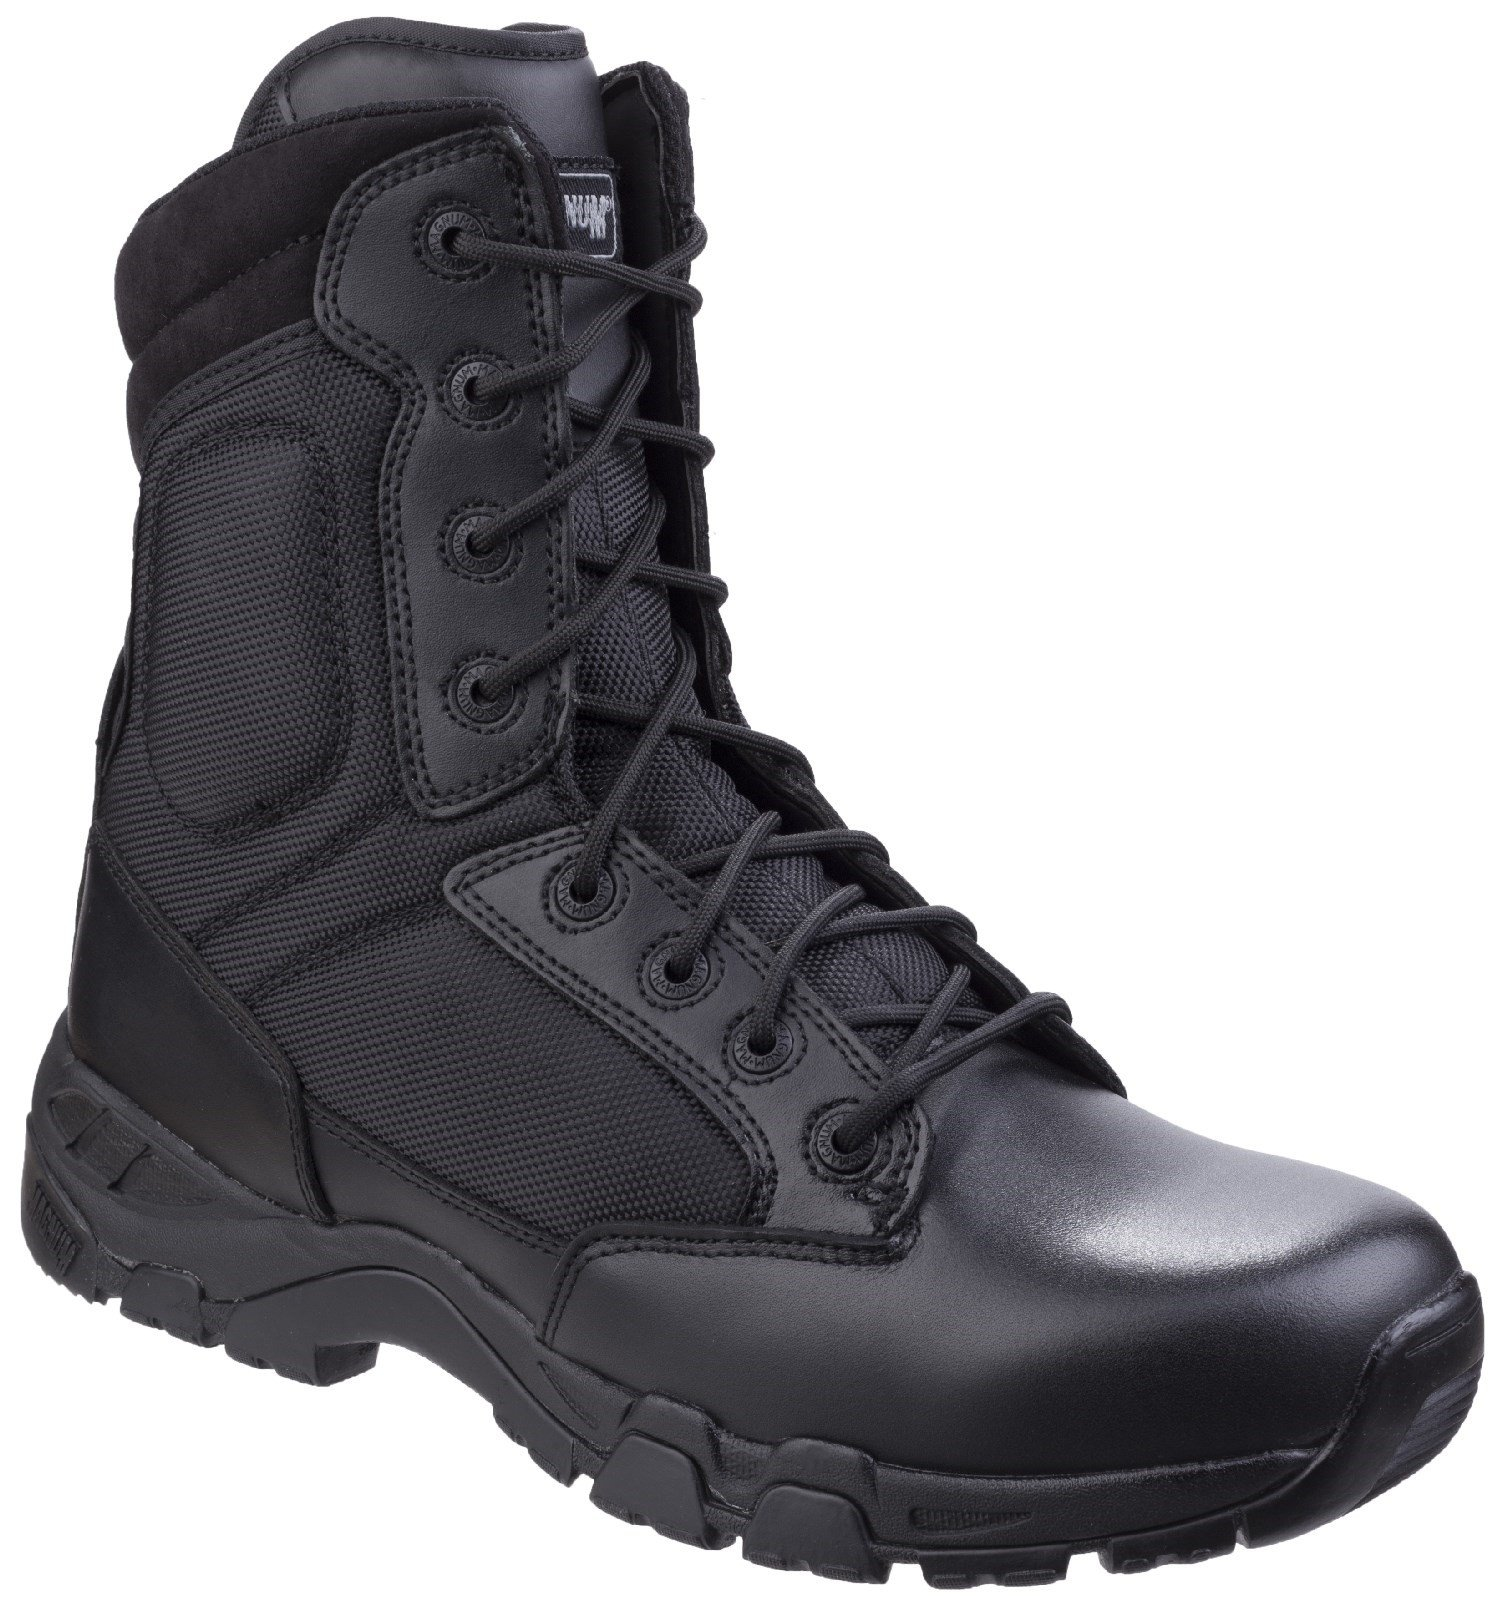 Magnum Unisex Viper Pro 8.0 EN Lace Up Safety Boot Black 22415 - Black 3